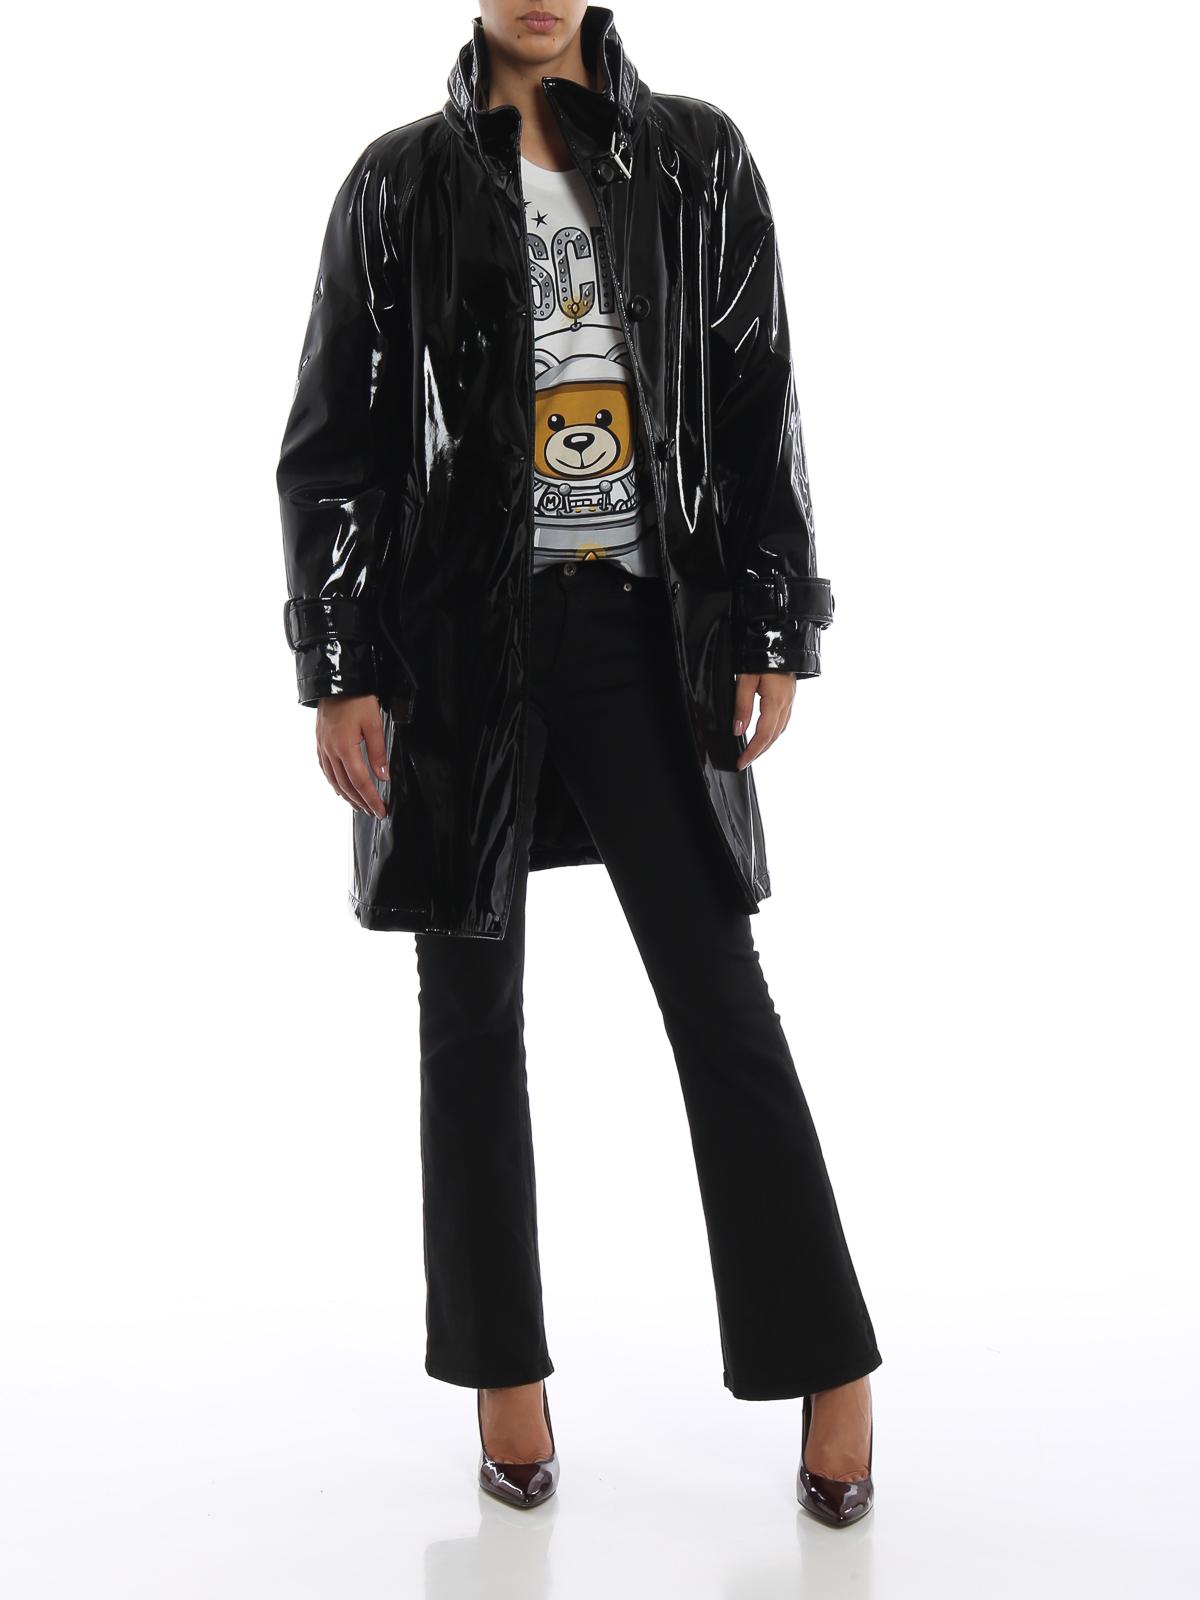 Moschino Black Glossy Vinyl Trench Coat Trench Coats